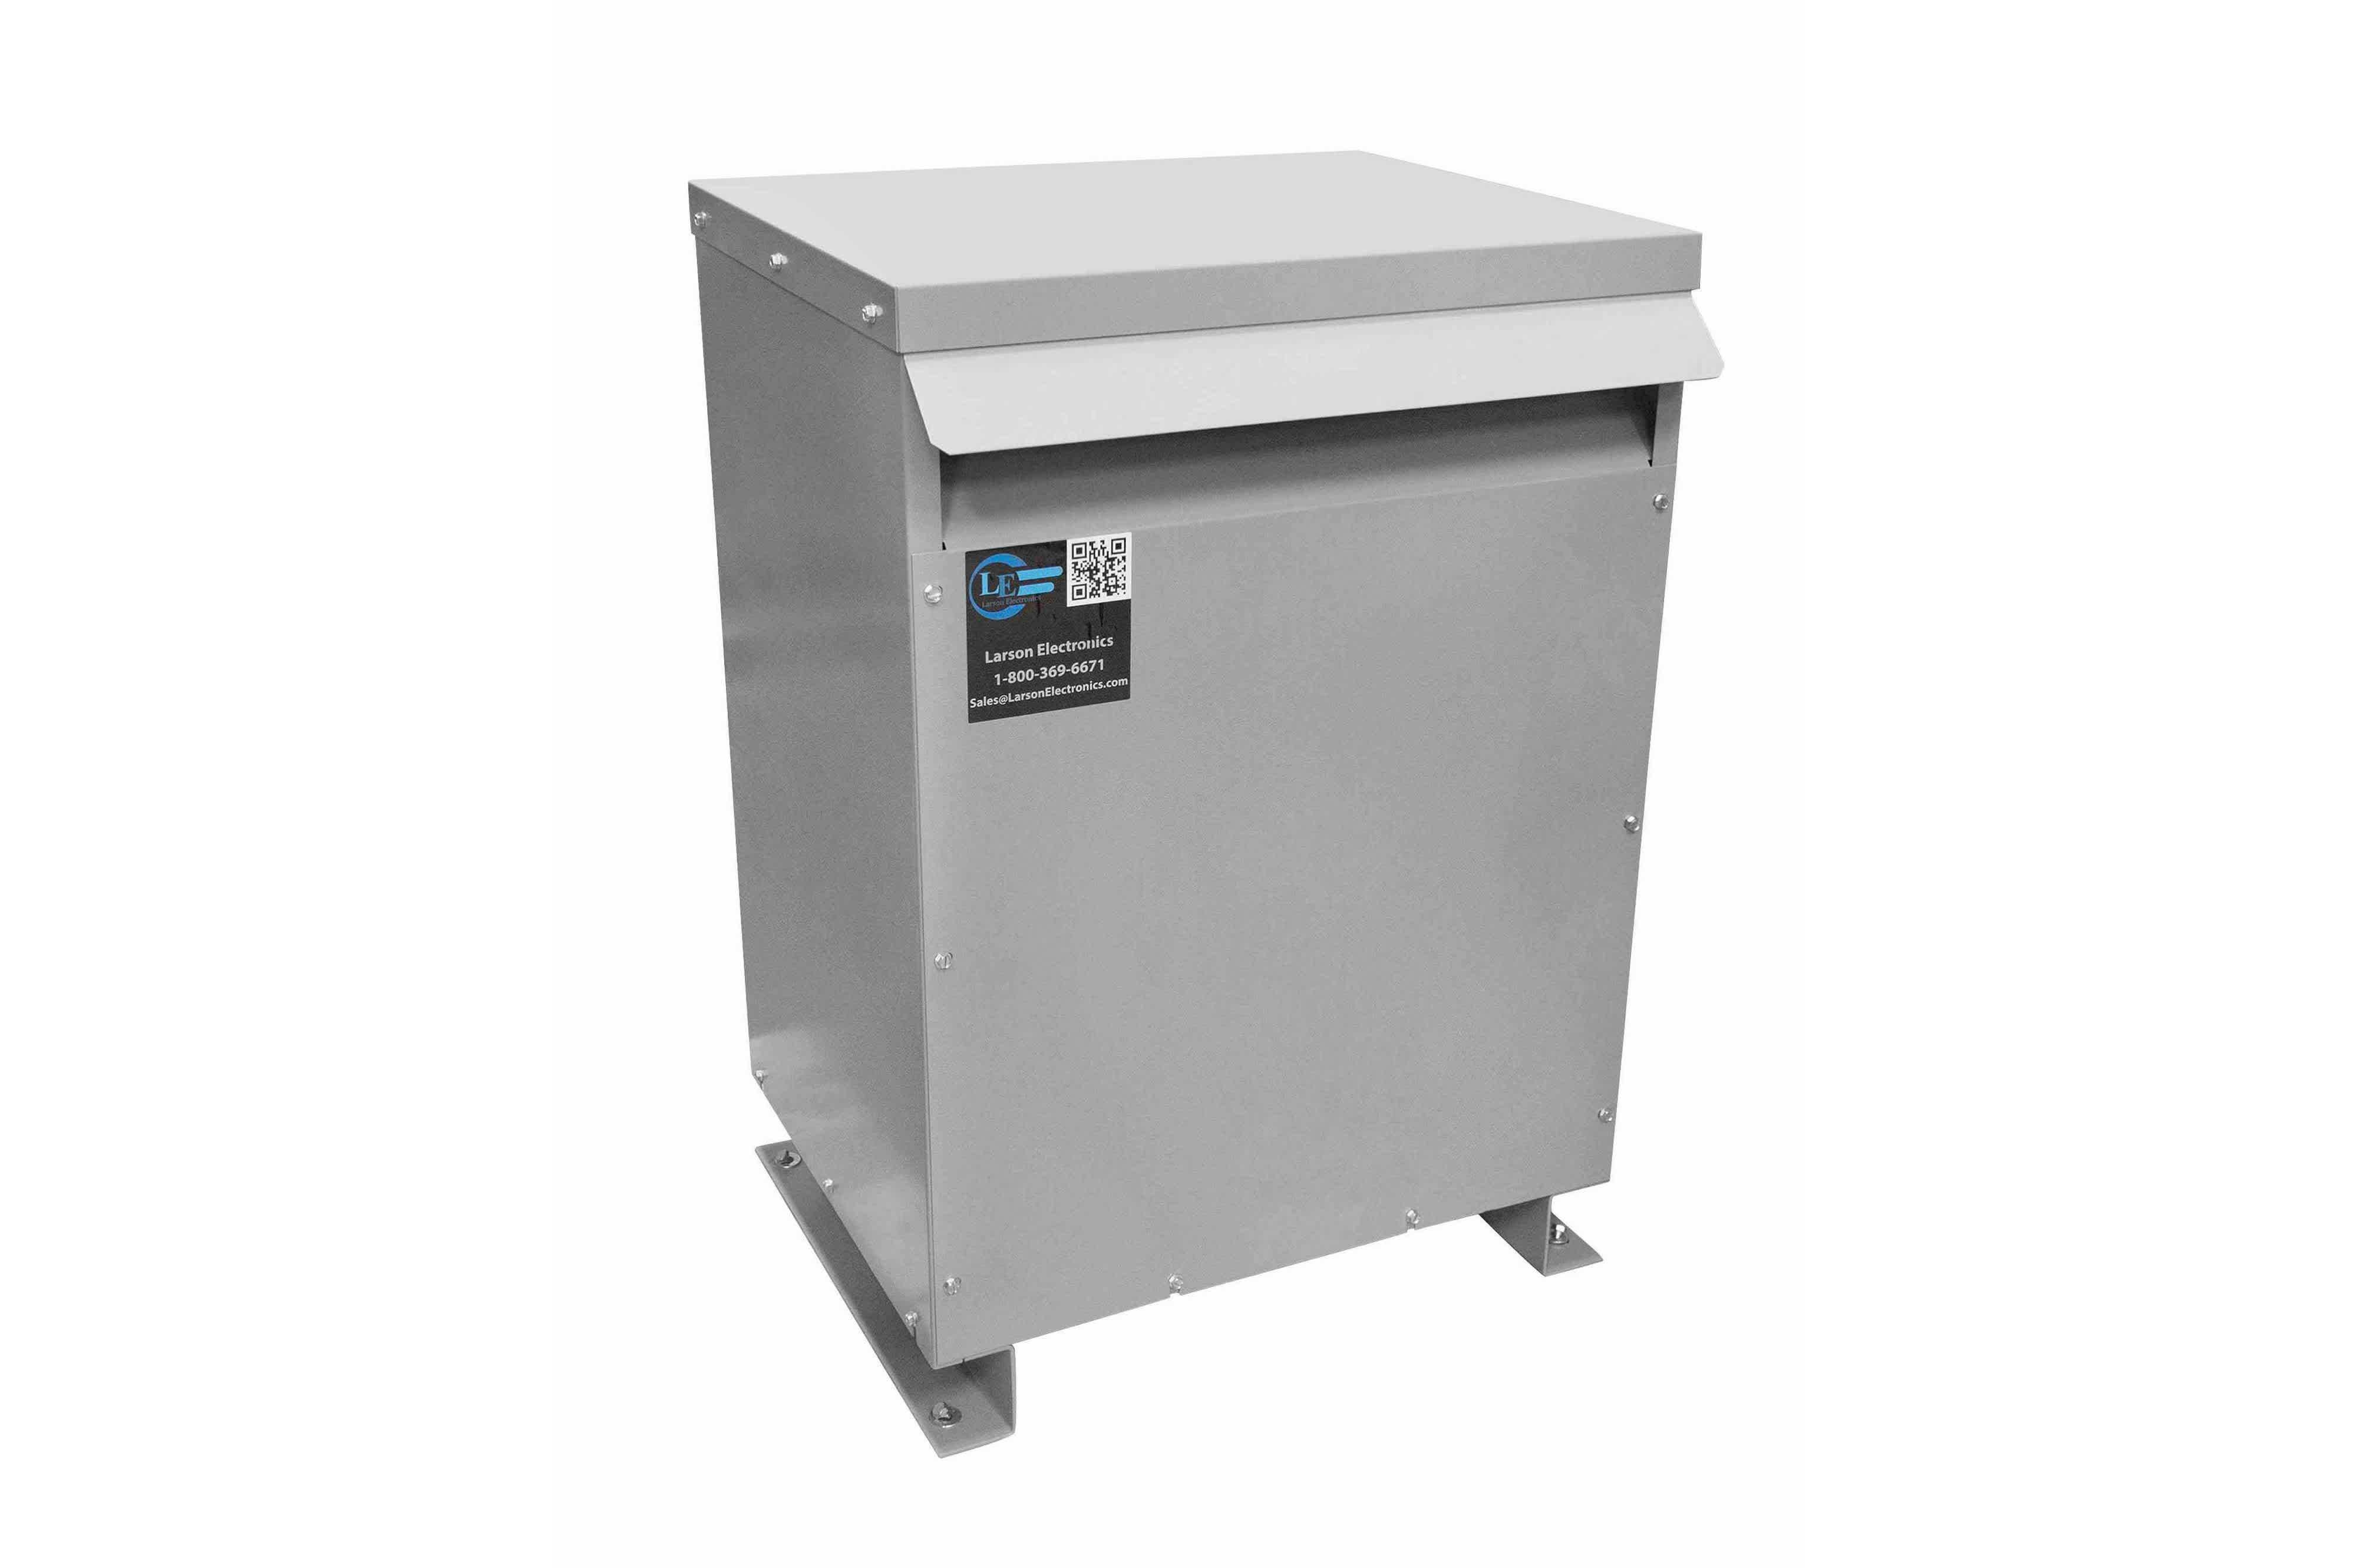 115 kVA 3PH Isolation Transformer, 480V Wye Primary, 400V Delta Secondary, N3R, Ventilated, 60 Hz